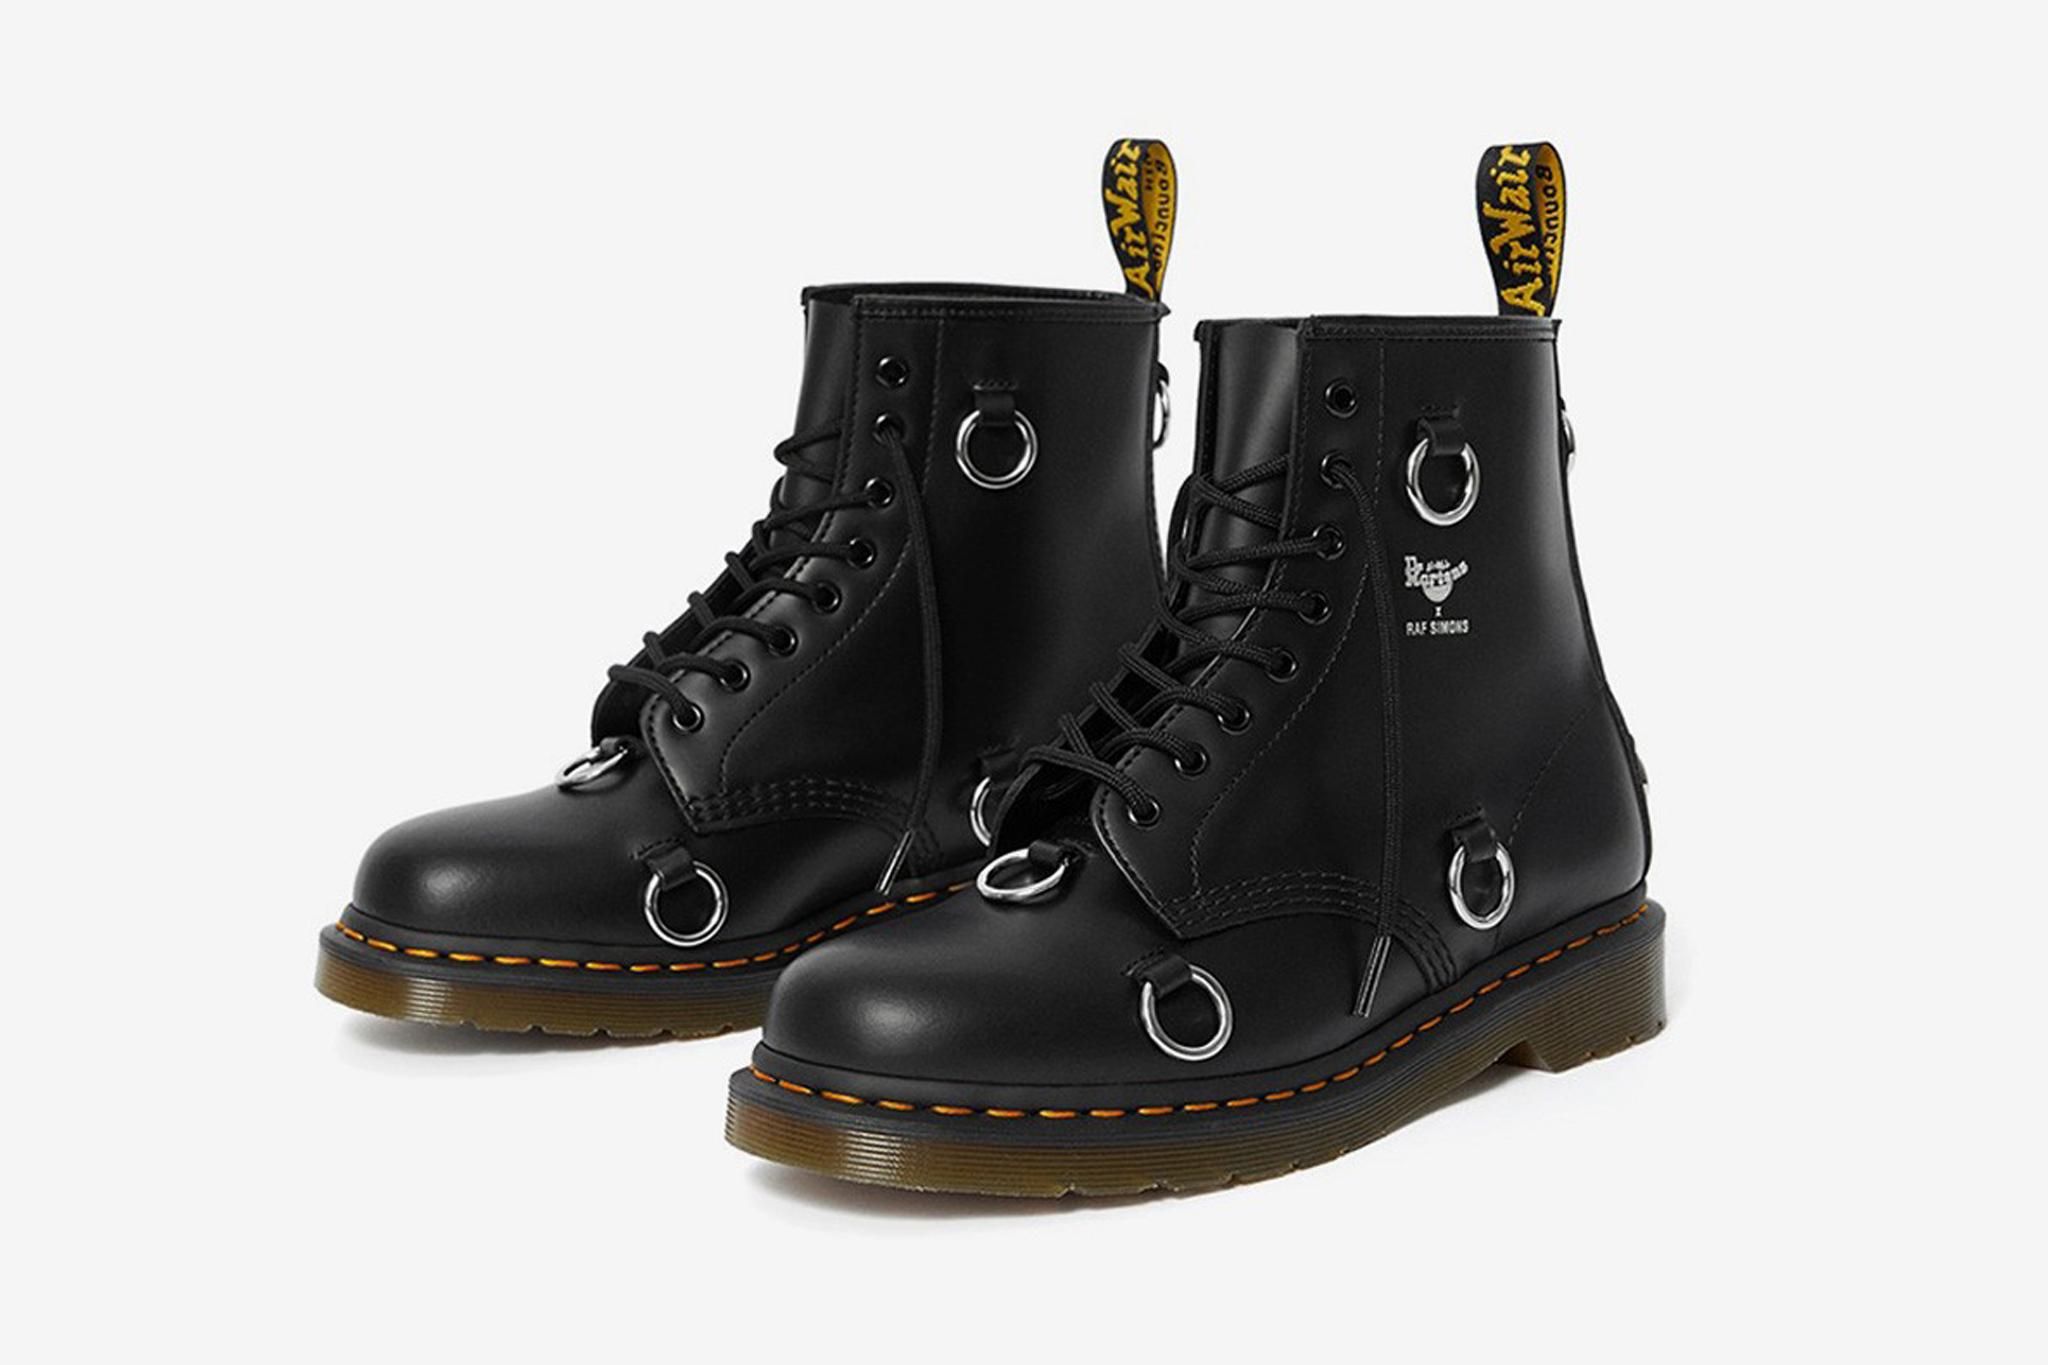 Raf Simons' Dr. Martens boot collab